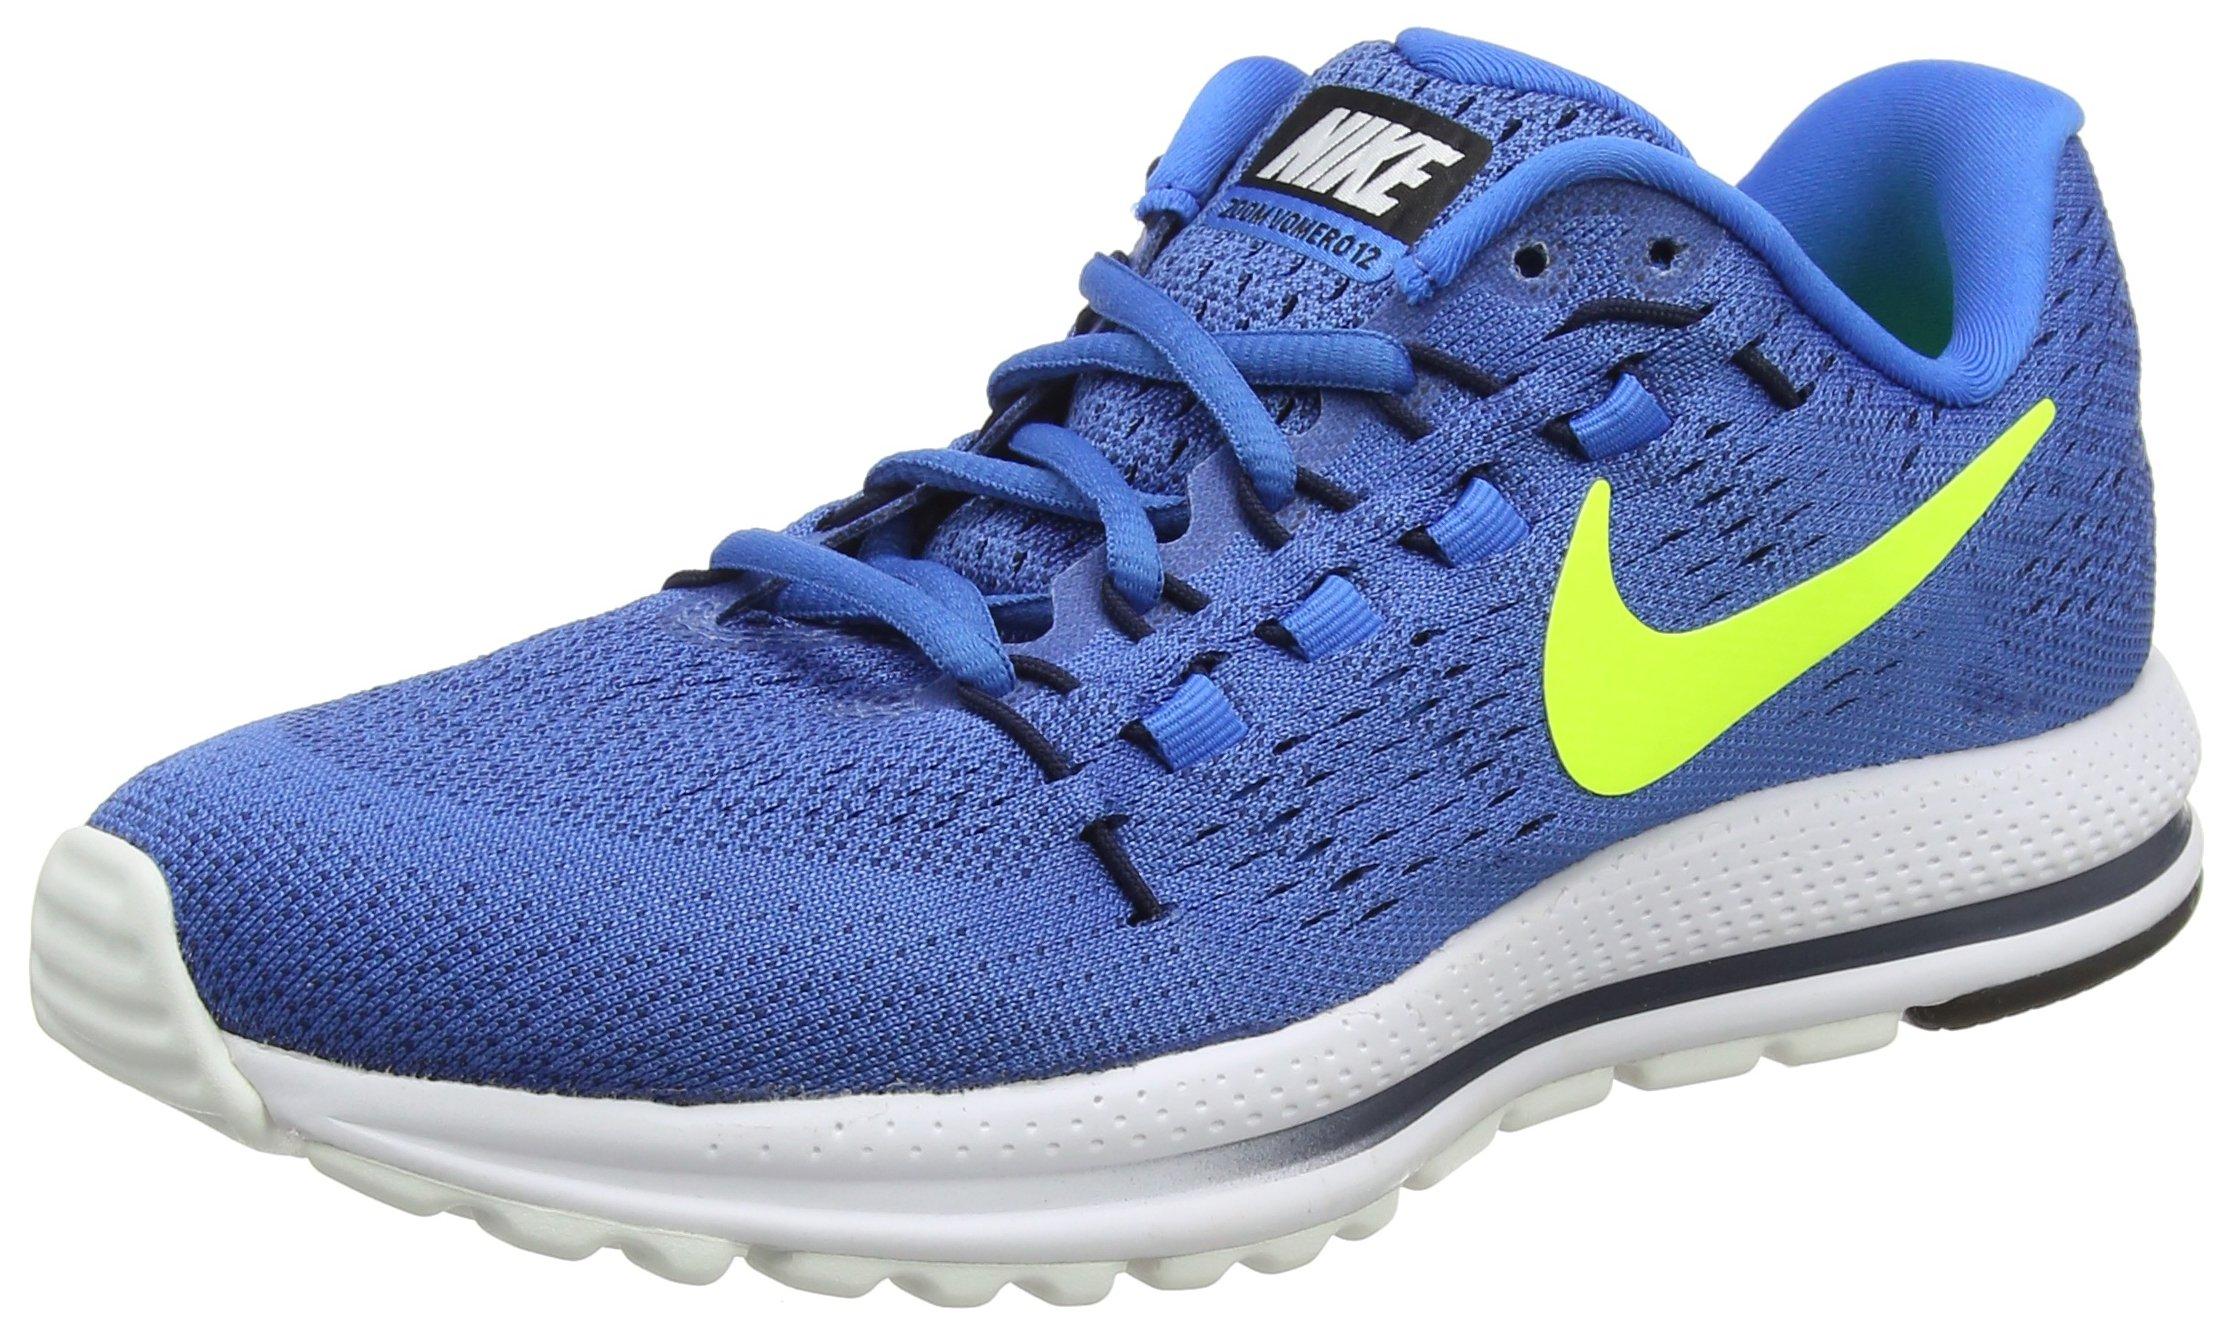 3ecef82cae2c Galleon - NIKE Air Zoom Vomero 12 Sz 10.5 Mens Running Star Blue Volt-Italy  Blue-Obsidian Shoes